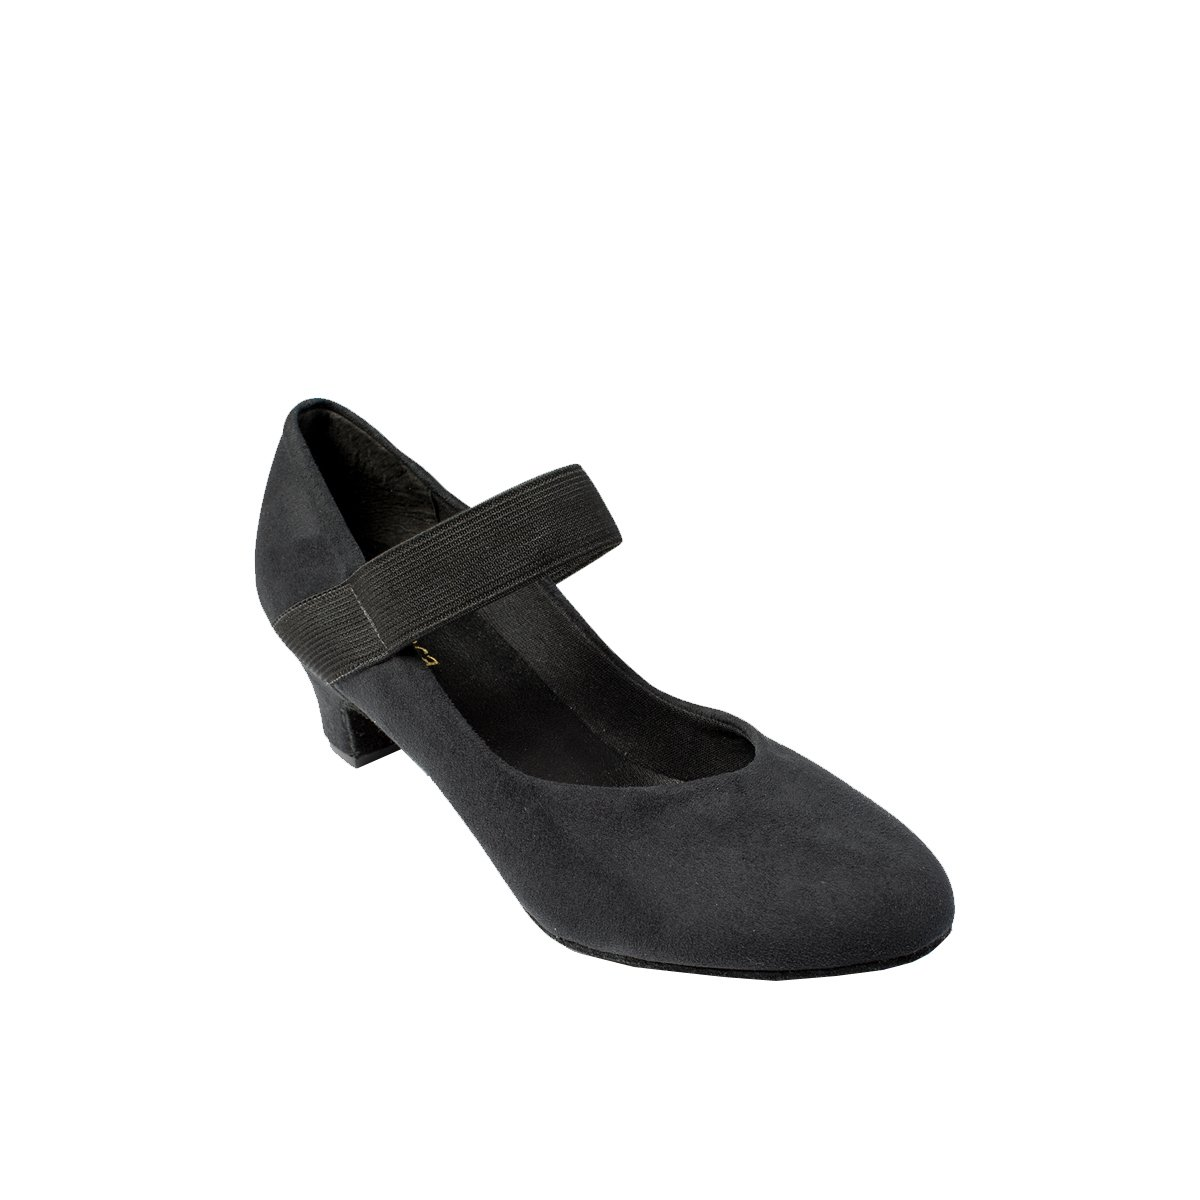 Sodanca Bl-184 Adult Raeni Ballroom Practice Shoe With 1.5 Heel